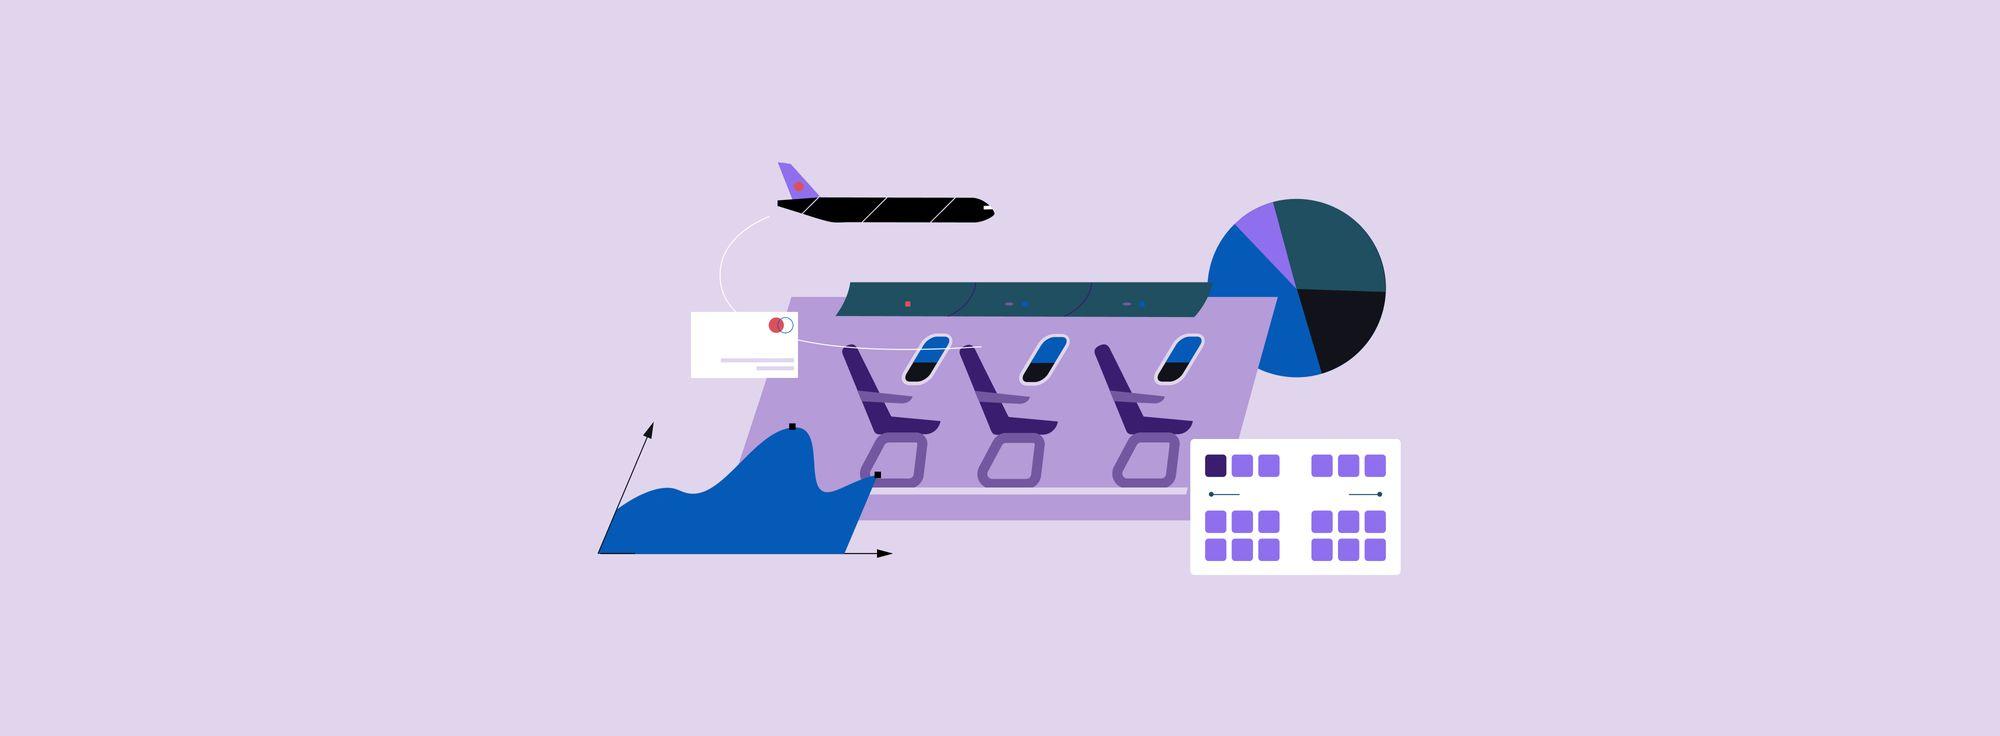 How do I make money selling flights?